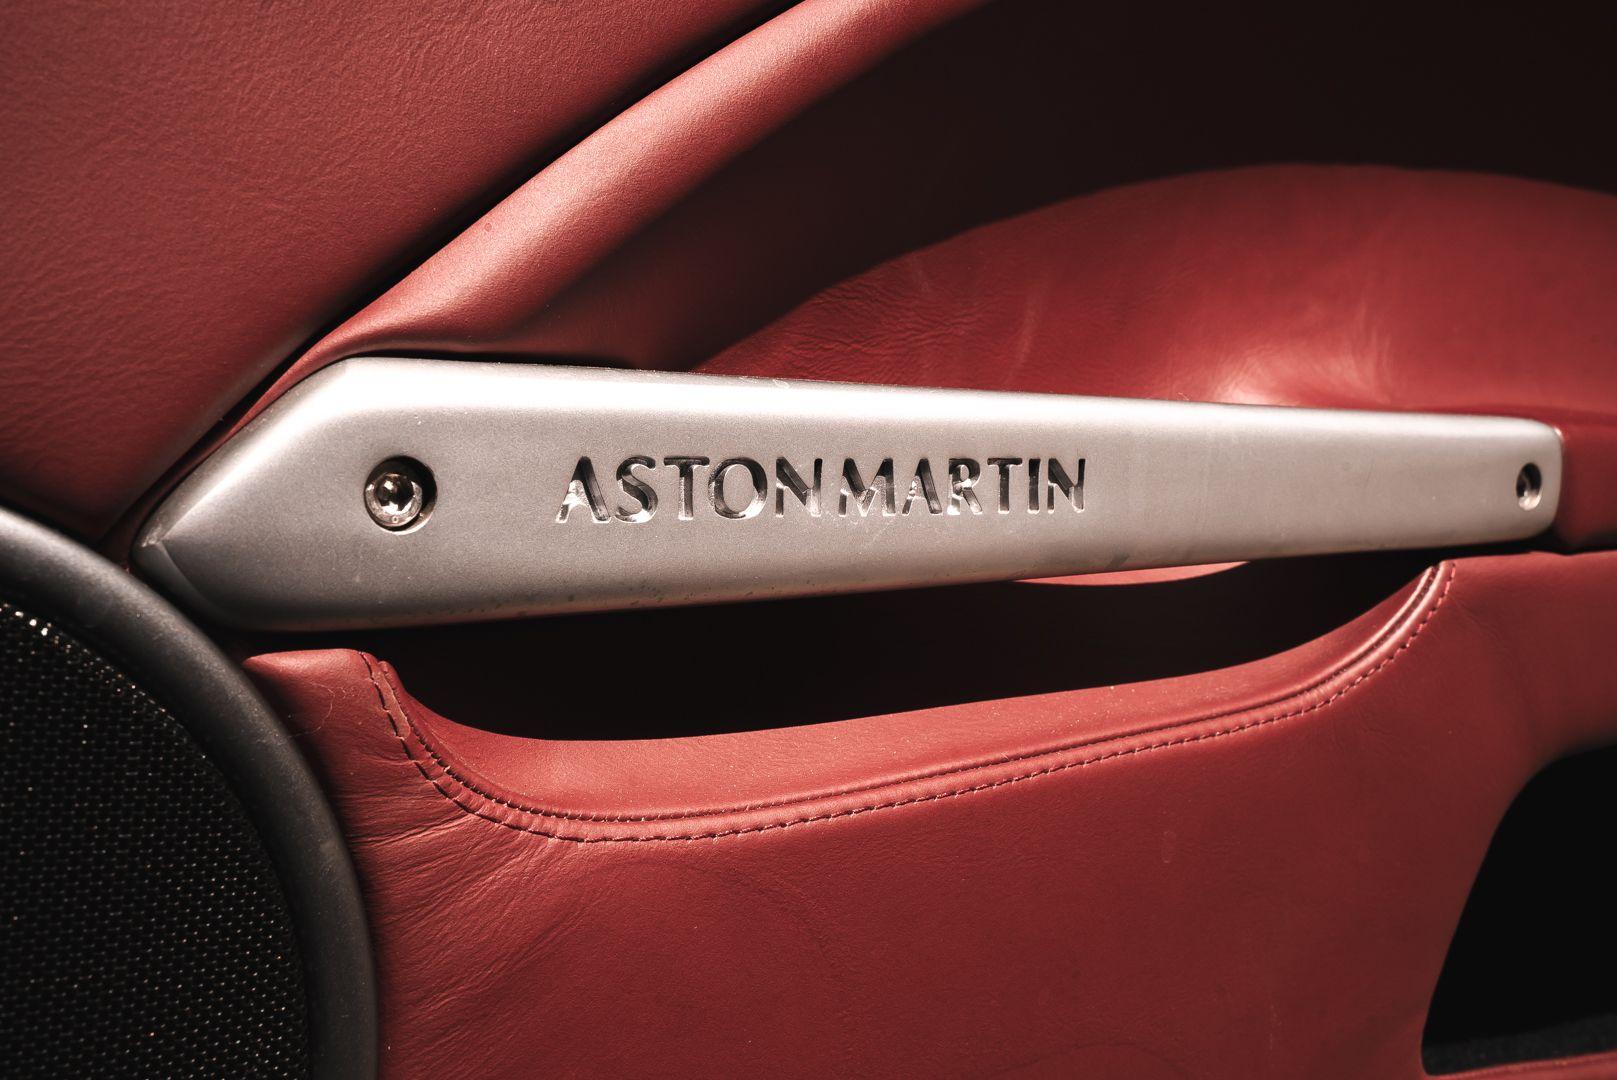 2001 Aston Martin V12 Vanquish 67940